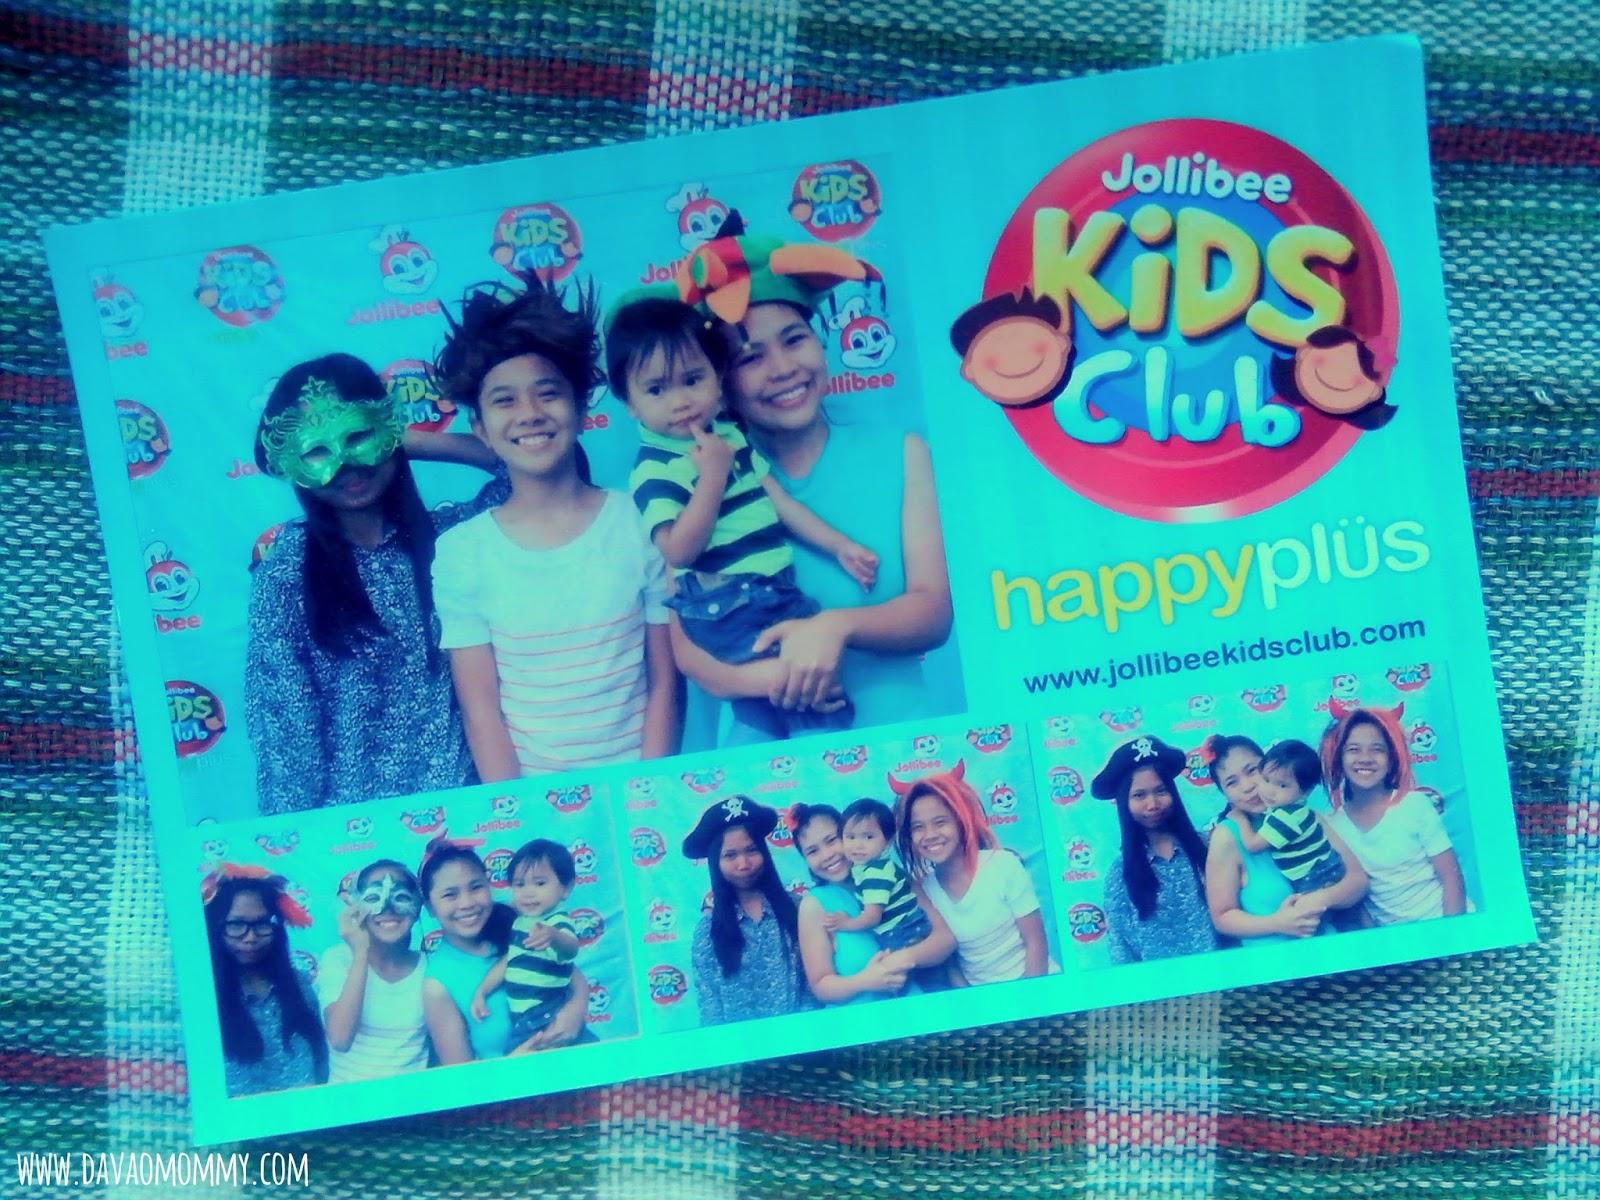 Jollibee Kids Club, Jollibee Happy Plus Card